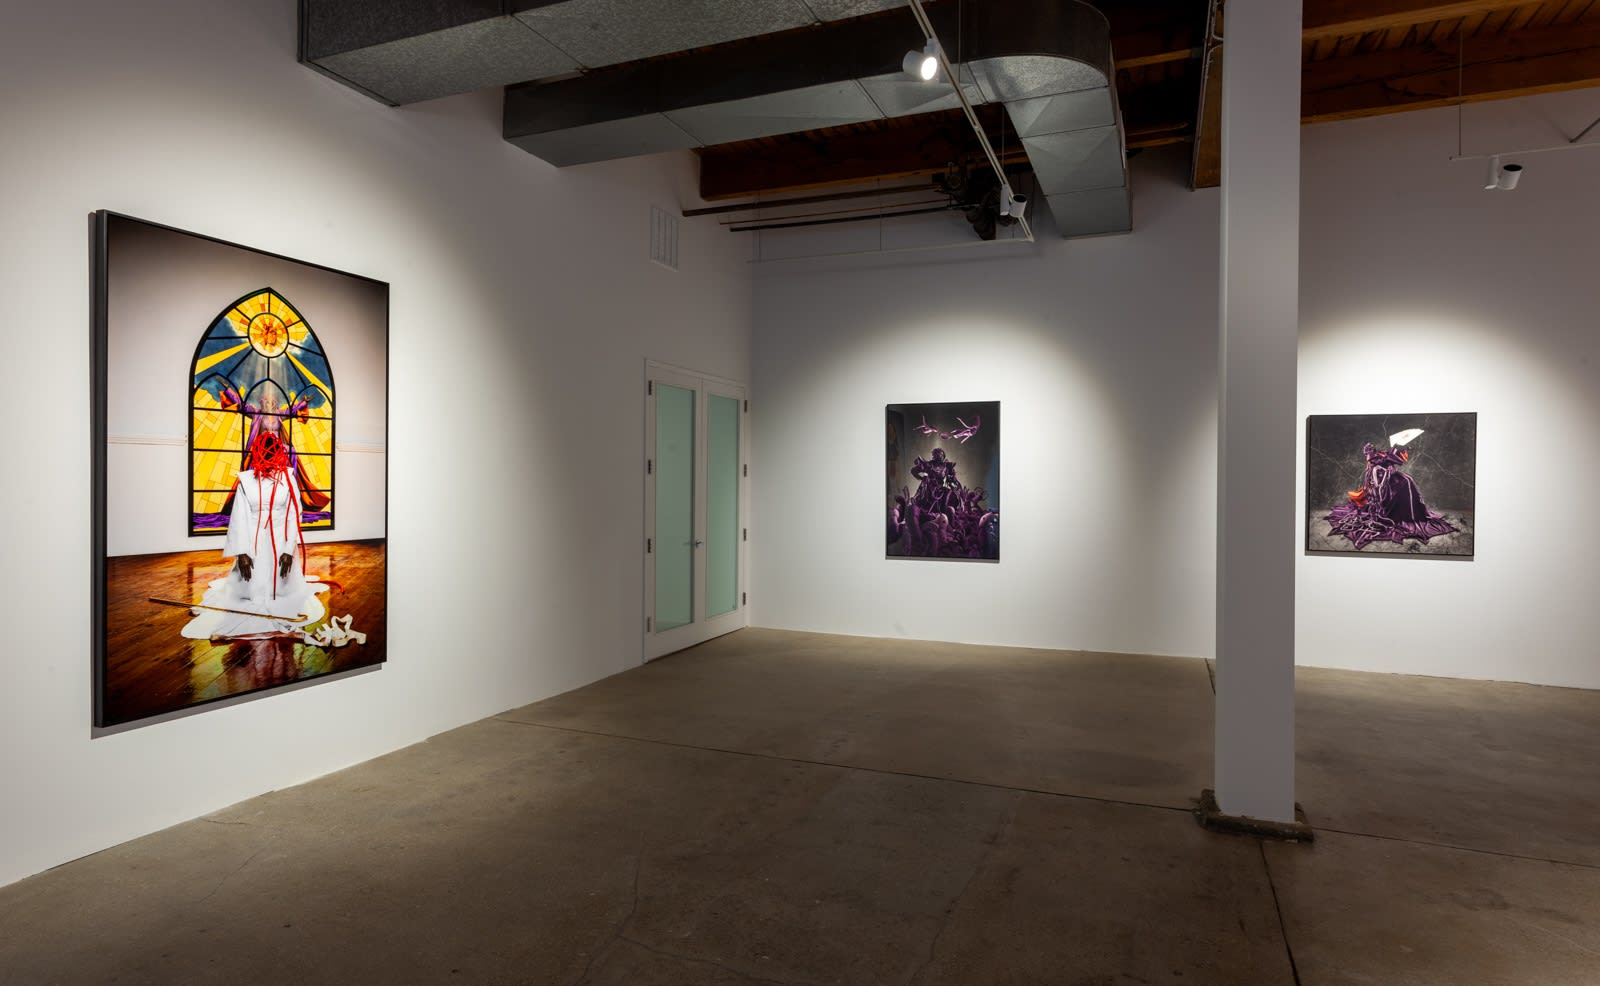 Installation view of Mary Sibande: Unhand Me, Demon!, Kavi Gupta | Washington Blvd., Chicago, 2021